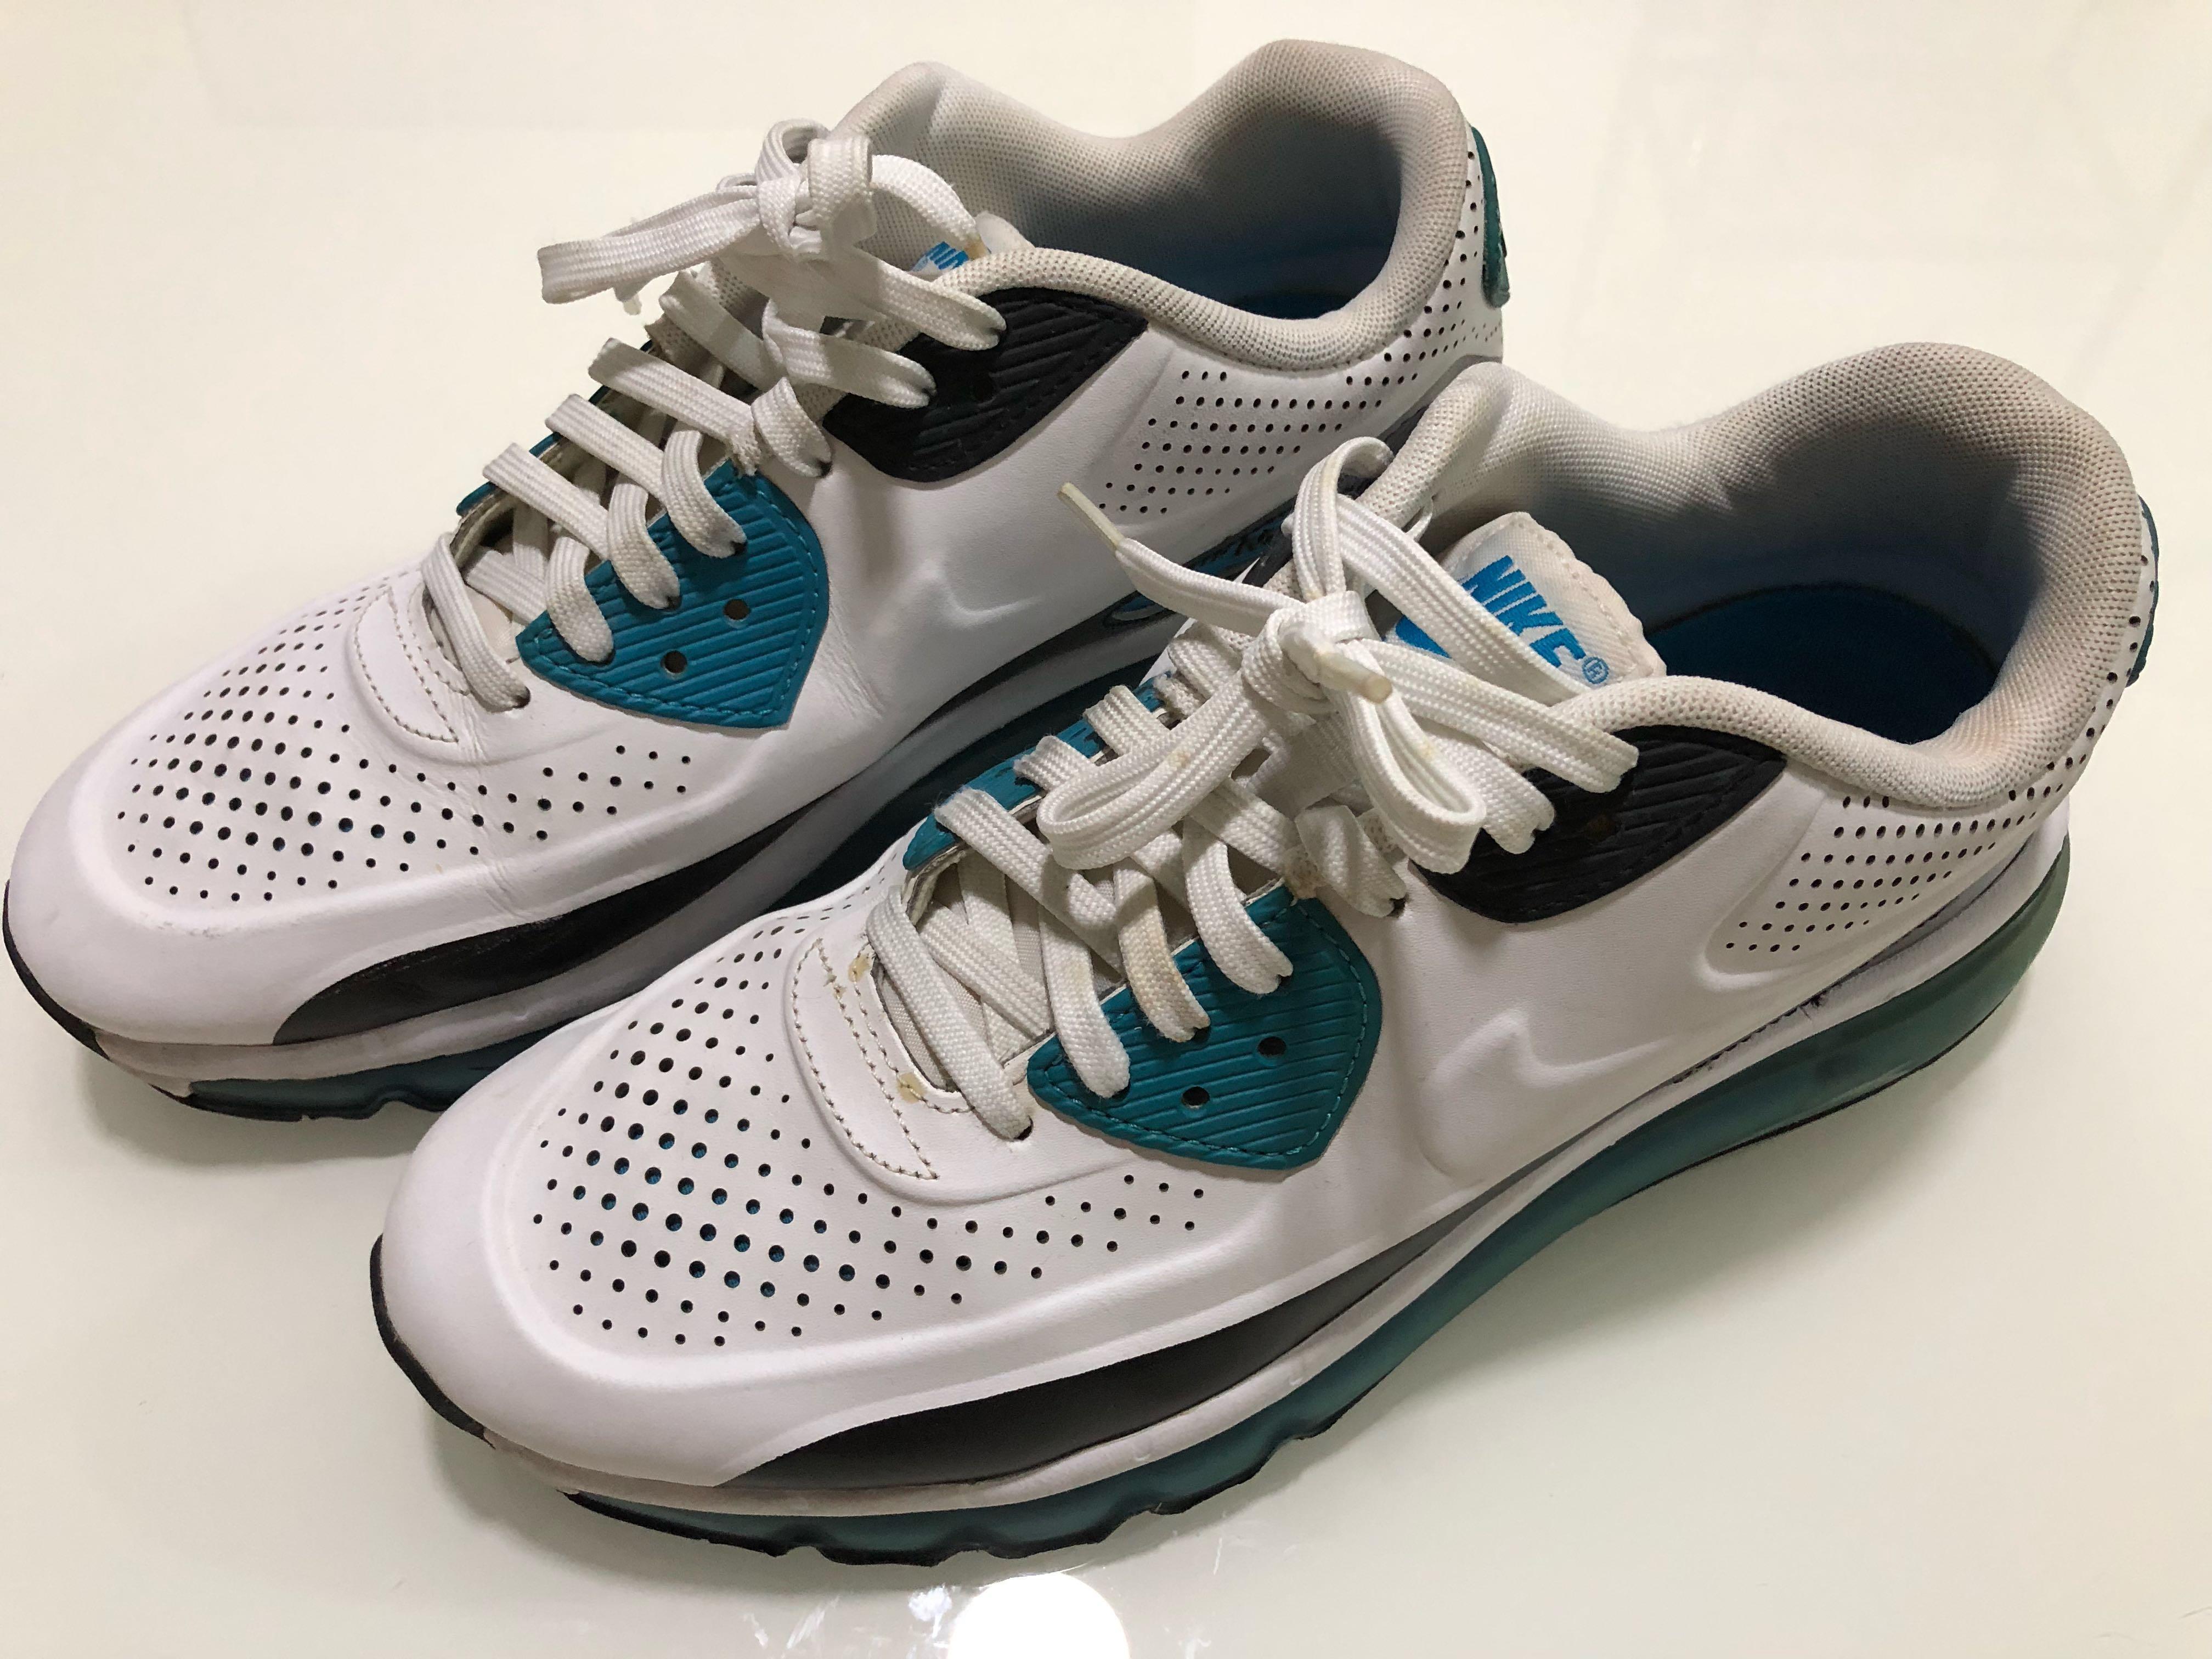 finest selection ec85d bdd77 AirMax 90, Men s Fashion, Footwear, Sneakers on Carousell